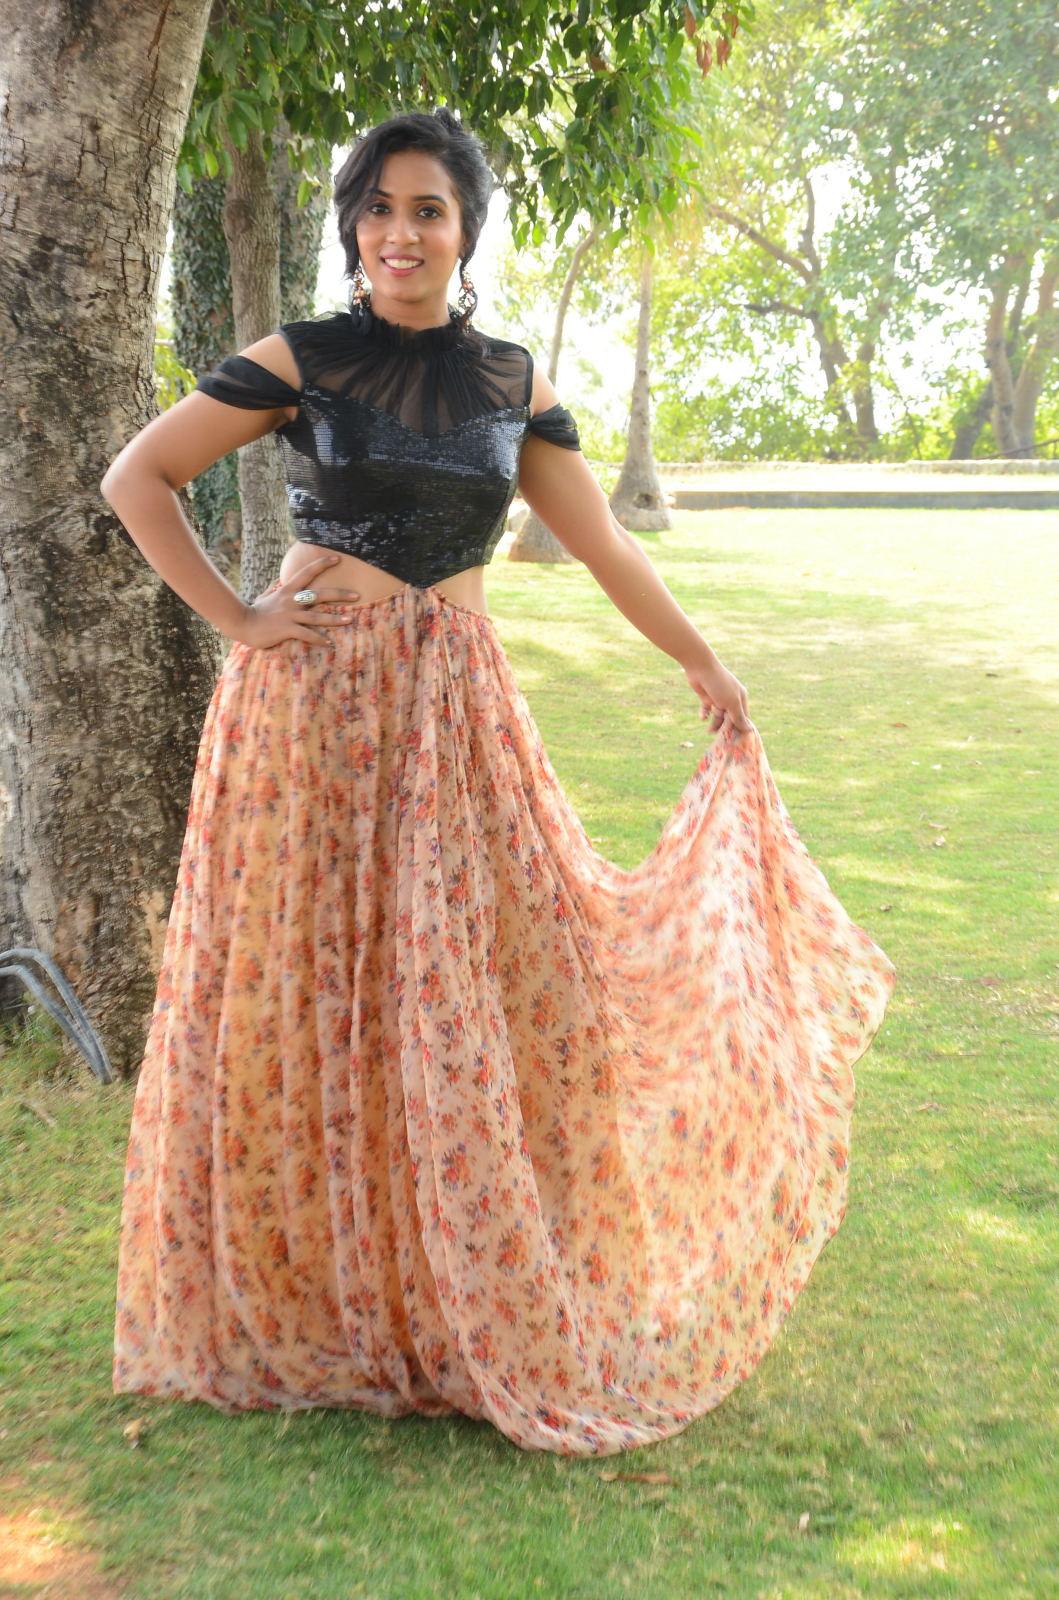 chetana uttej Brand New Photo Stills Of South Actress Chetana Uttej | Tollywood Chetana Uttej 16